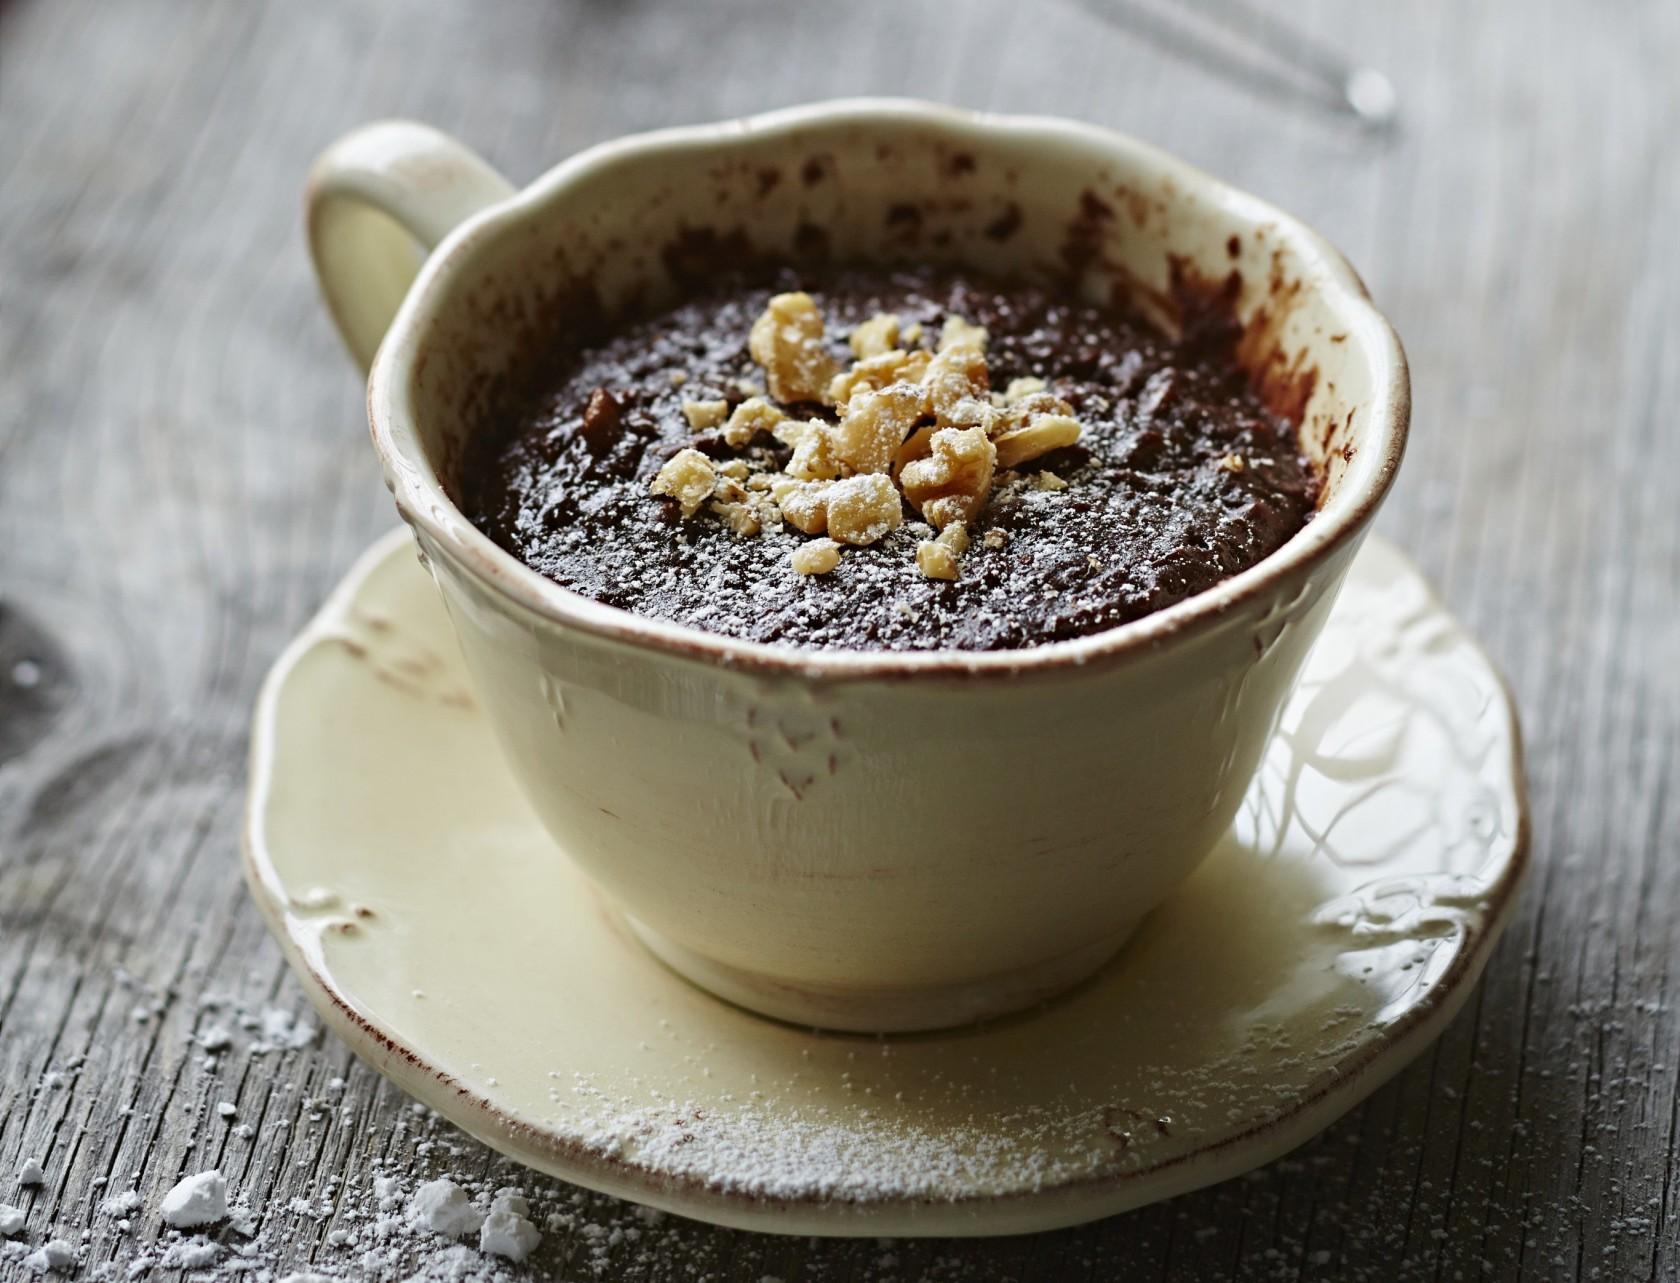 Kage i kop med chokolade - sjov opskrift på hurtig kage i mikrobølgeovn.